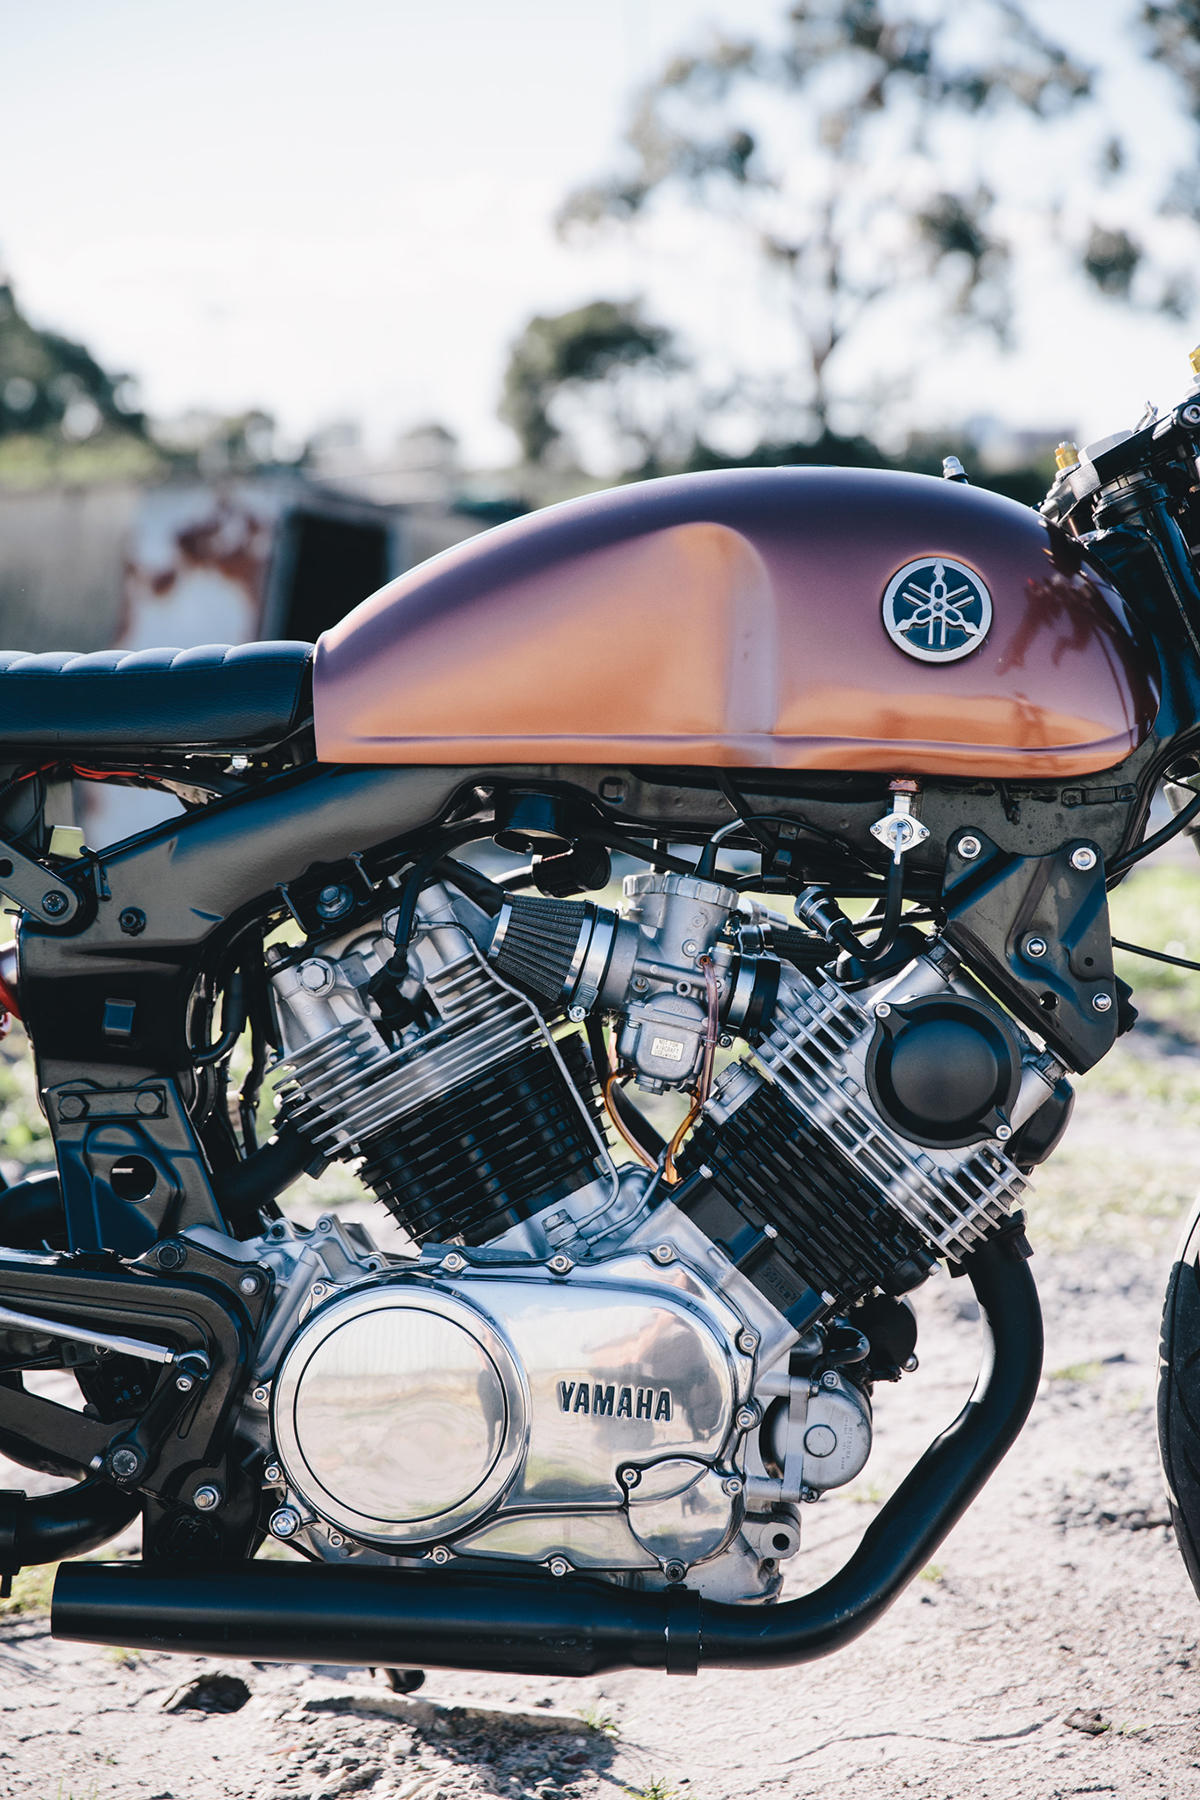 Yamaha_XV1000_Cafe_Racer_5025